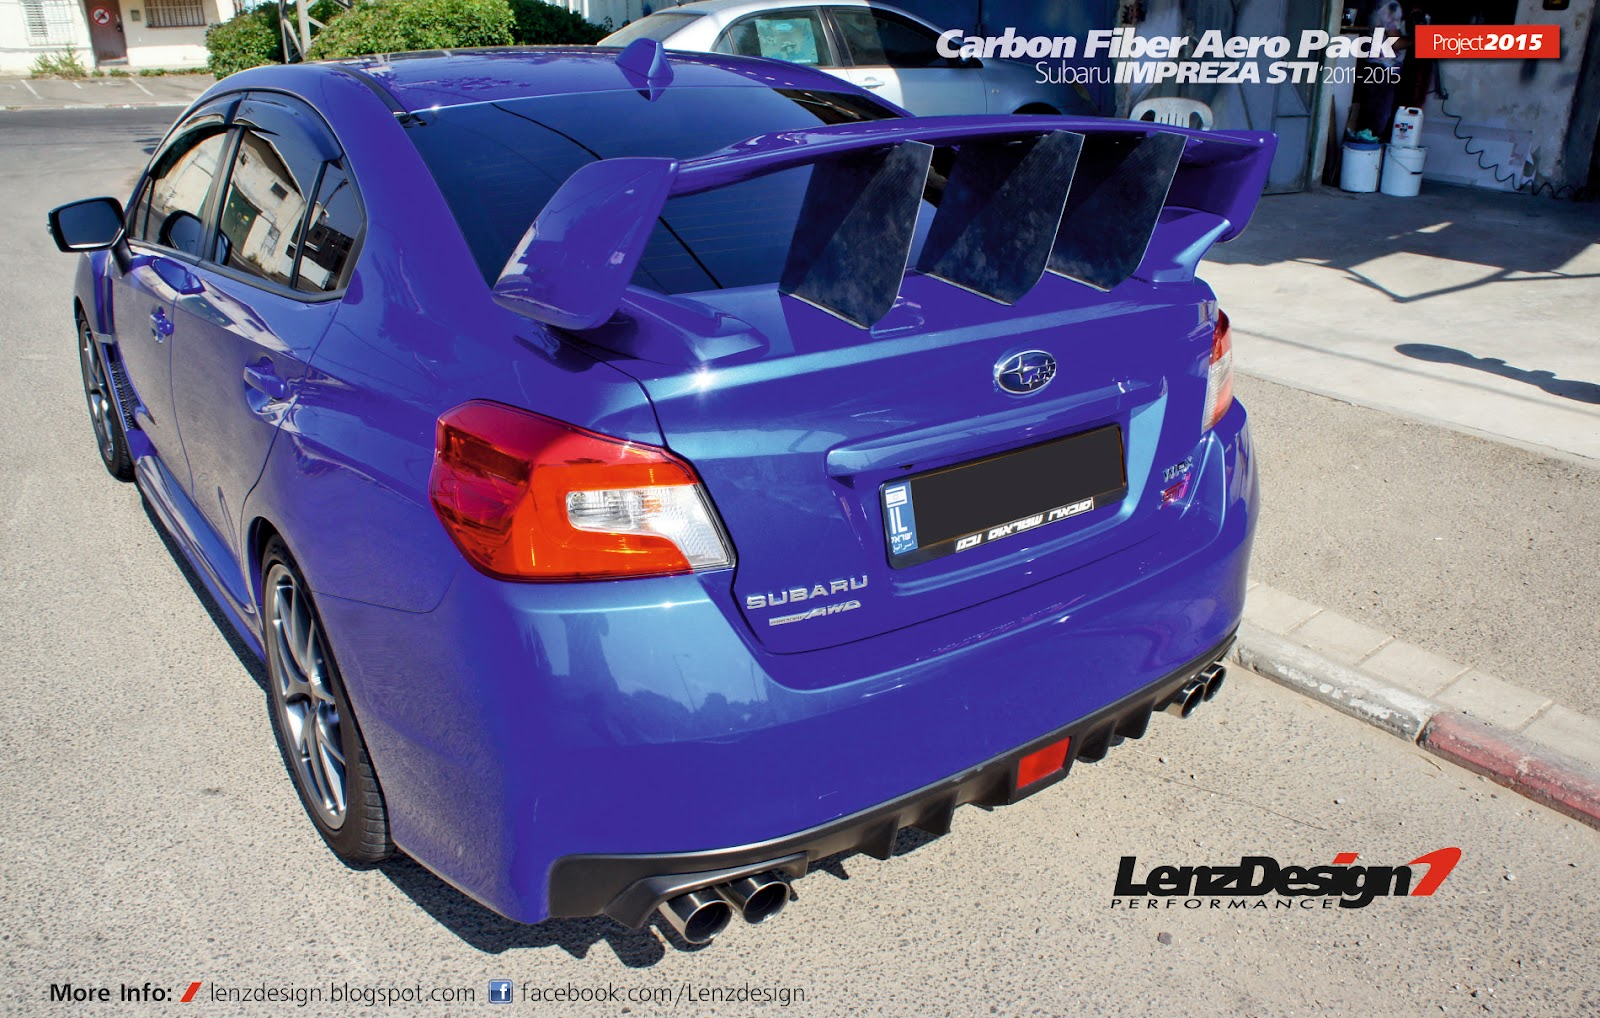 2012 Subaru Sti >> Subaru WRX STI 2014-2016 Carbon Fiber Roof Spoiler & Support Stabilizer by Lenzdesign